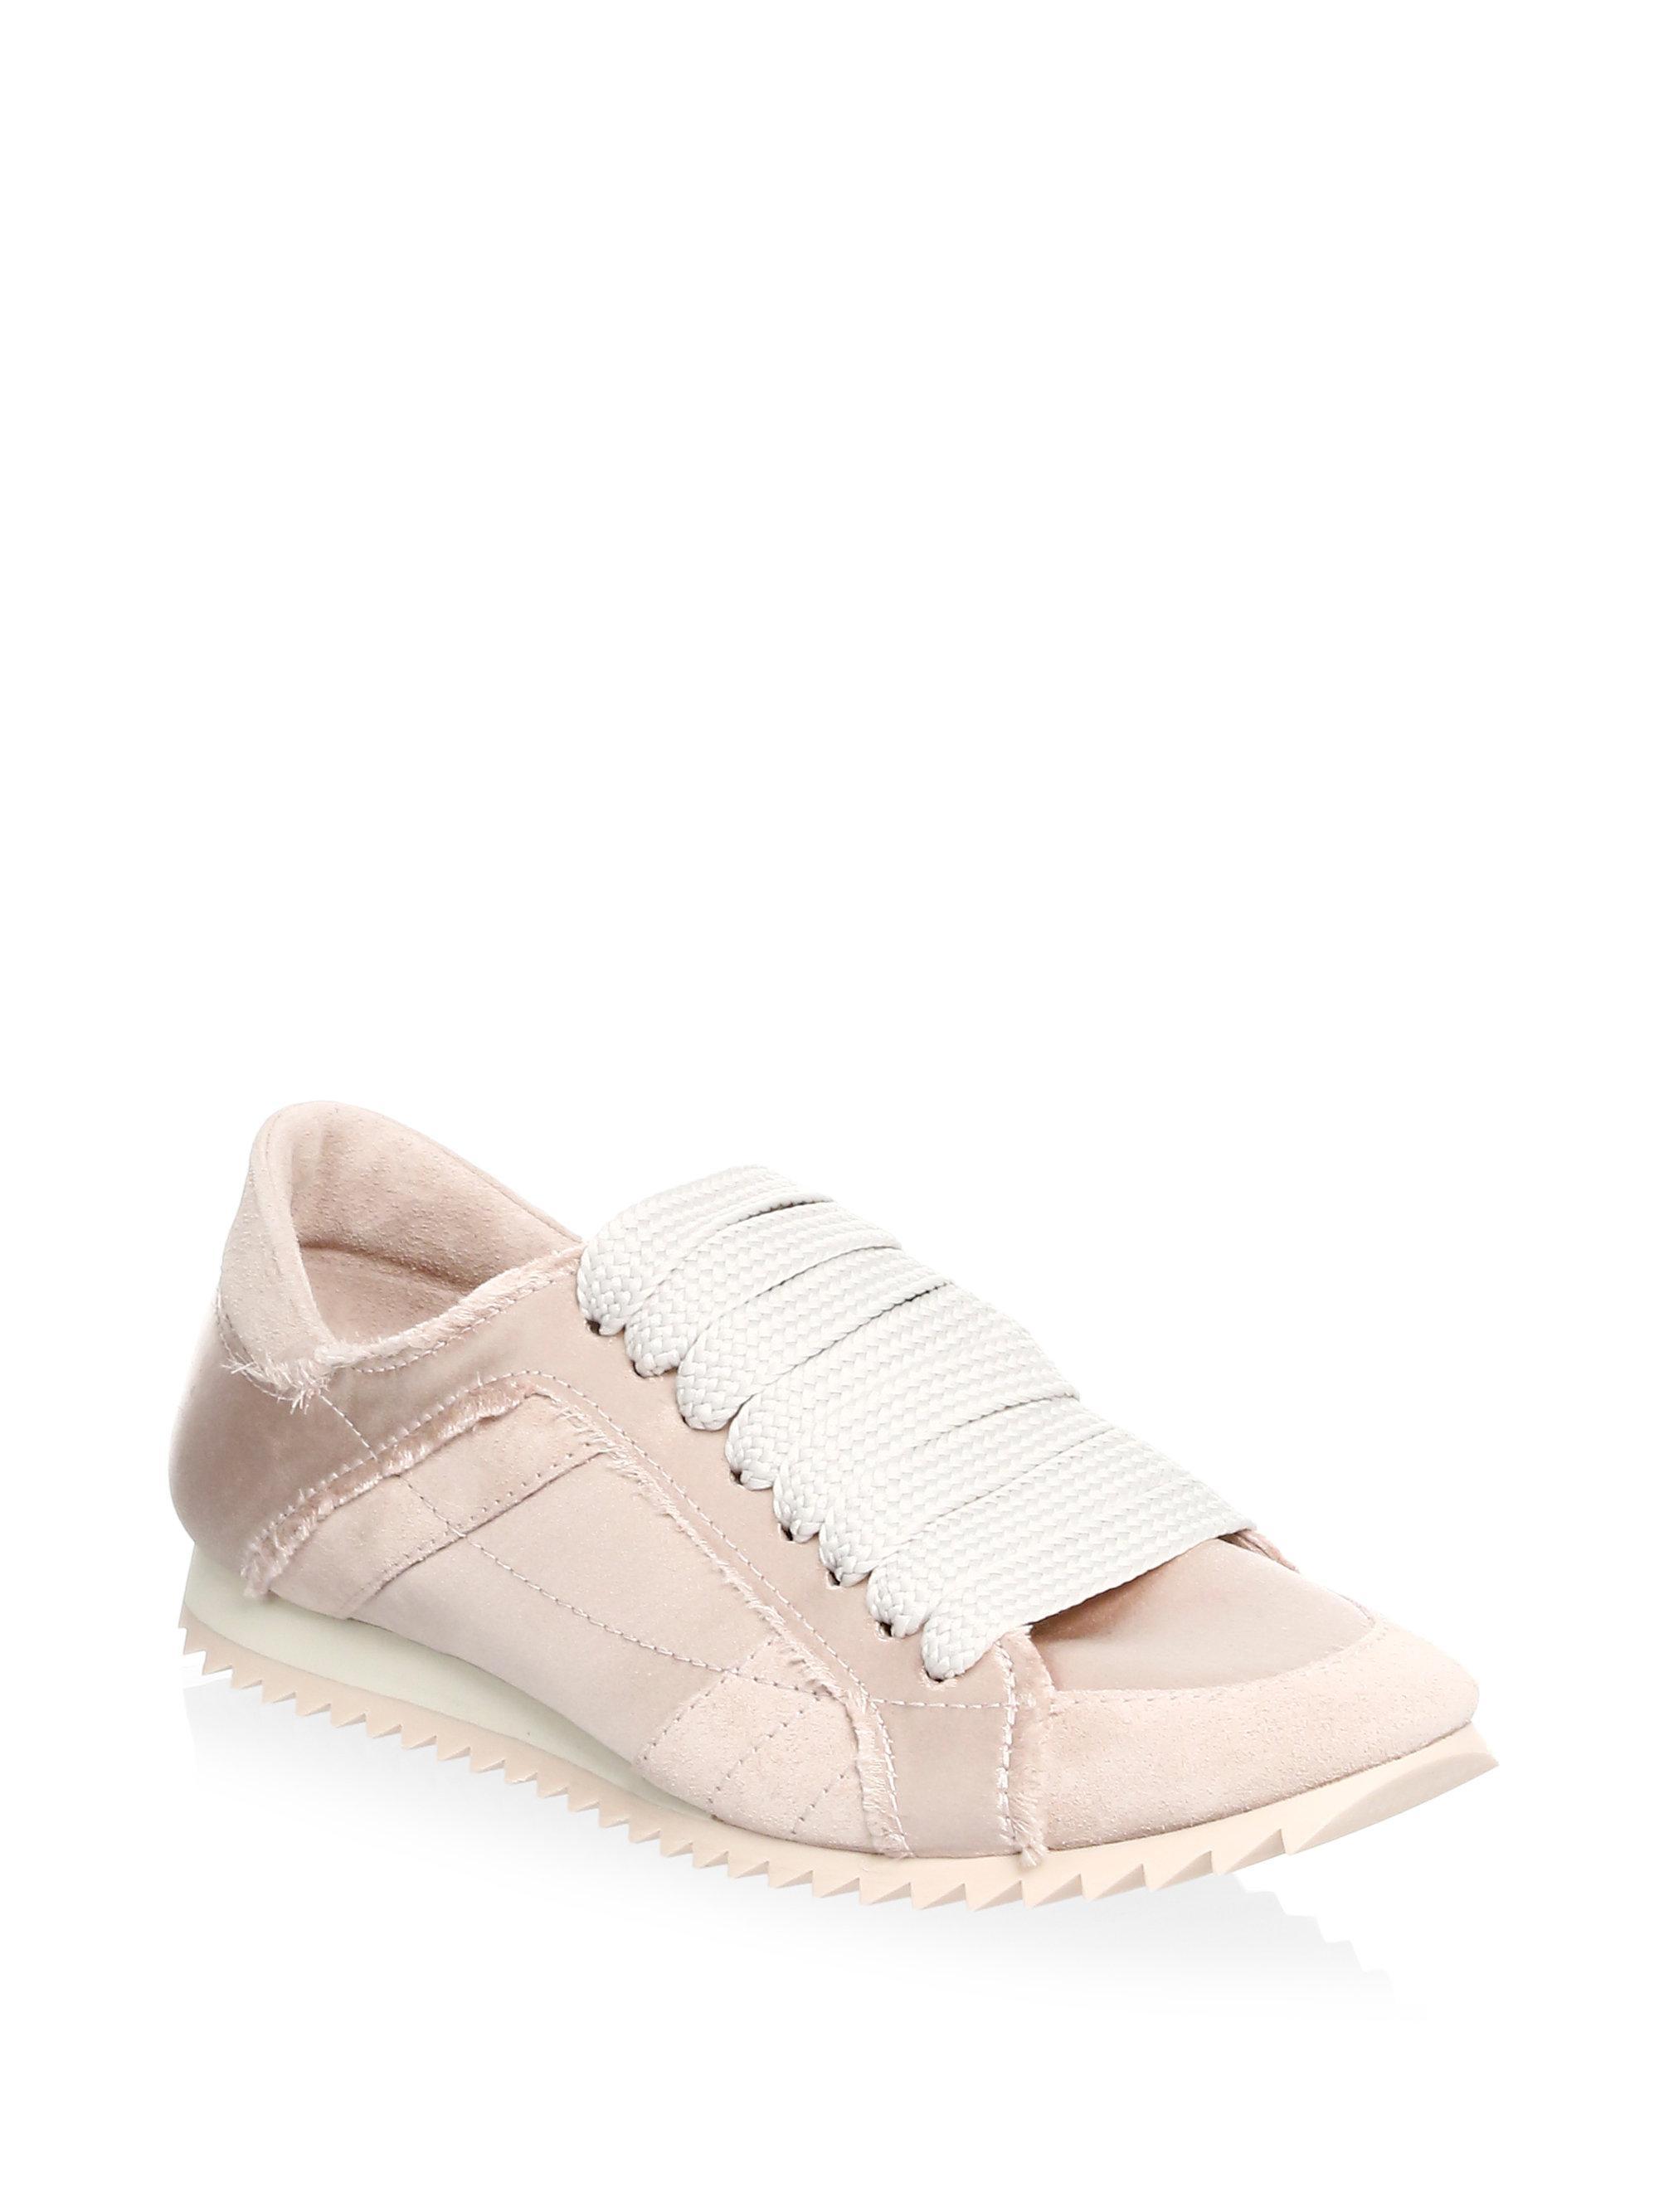 Pedro Garcia Cristina Satin Trainer Sneakers FhApFq19b